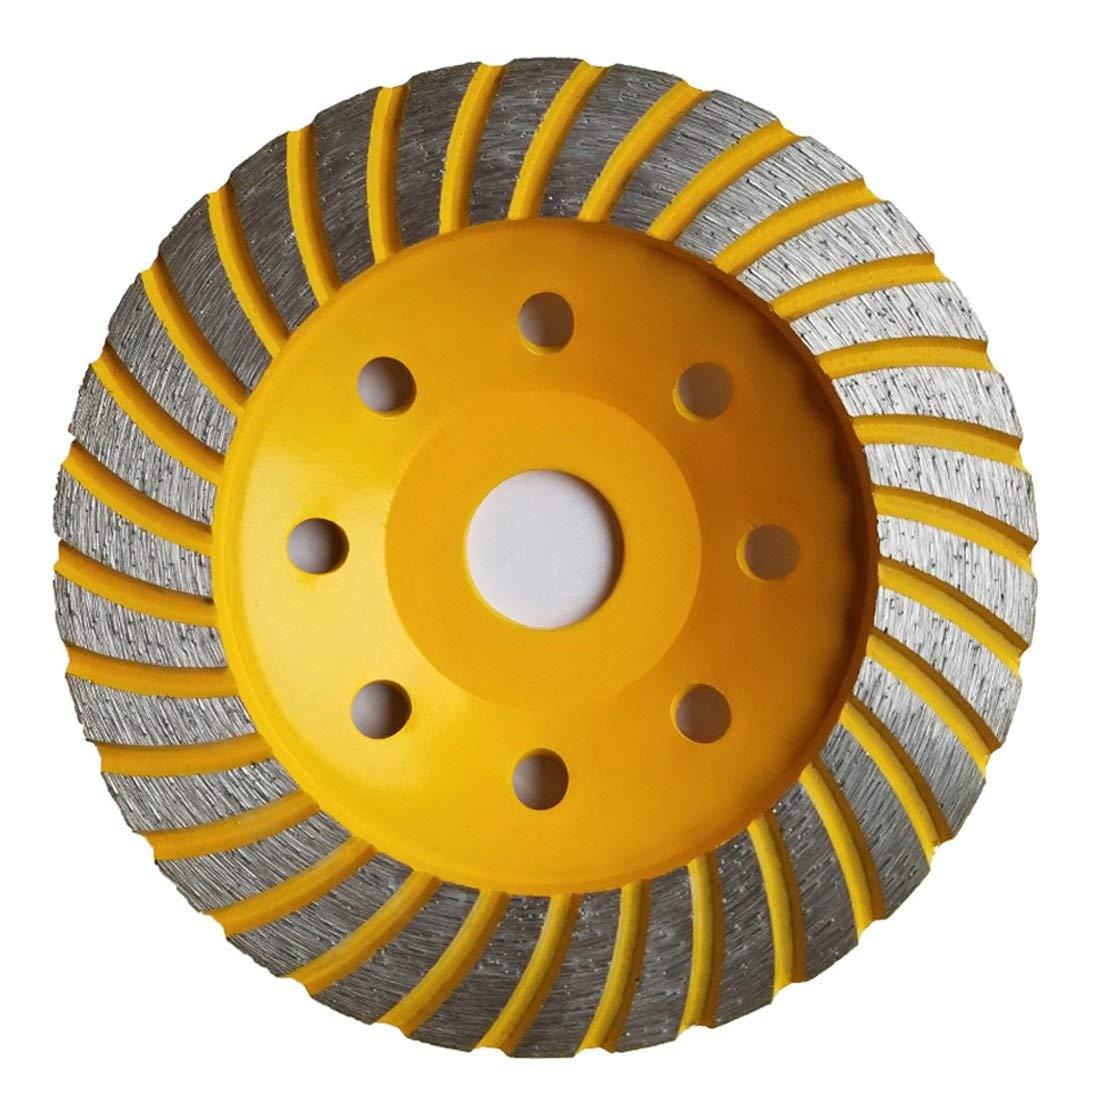 Aplus 5-Inch Diamond Cup Grinding Wheel, Turbo Diamond Grinder Disc for Concrete, Granite, Stone, Marble etc by APlus